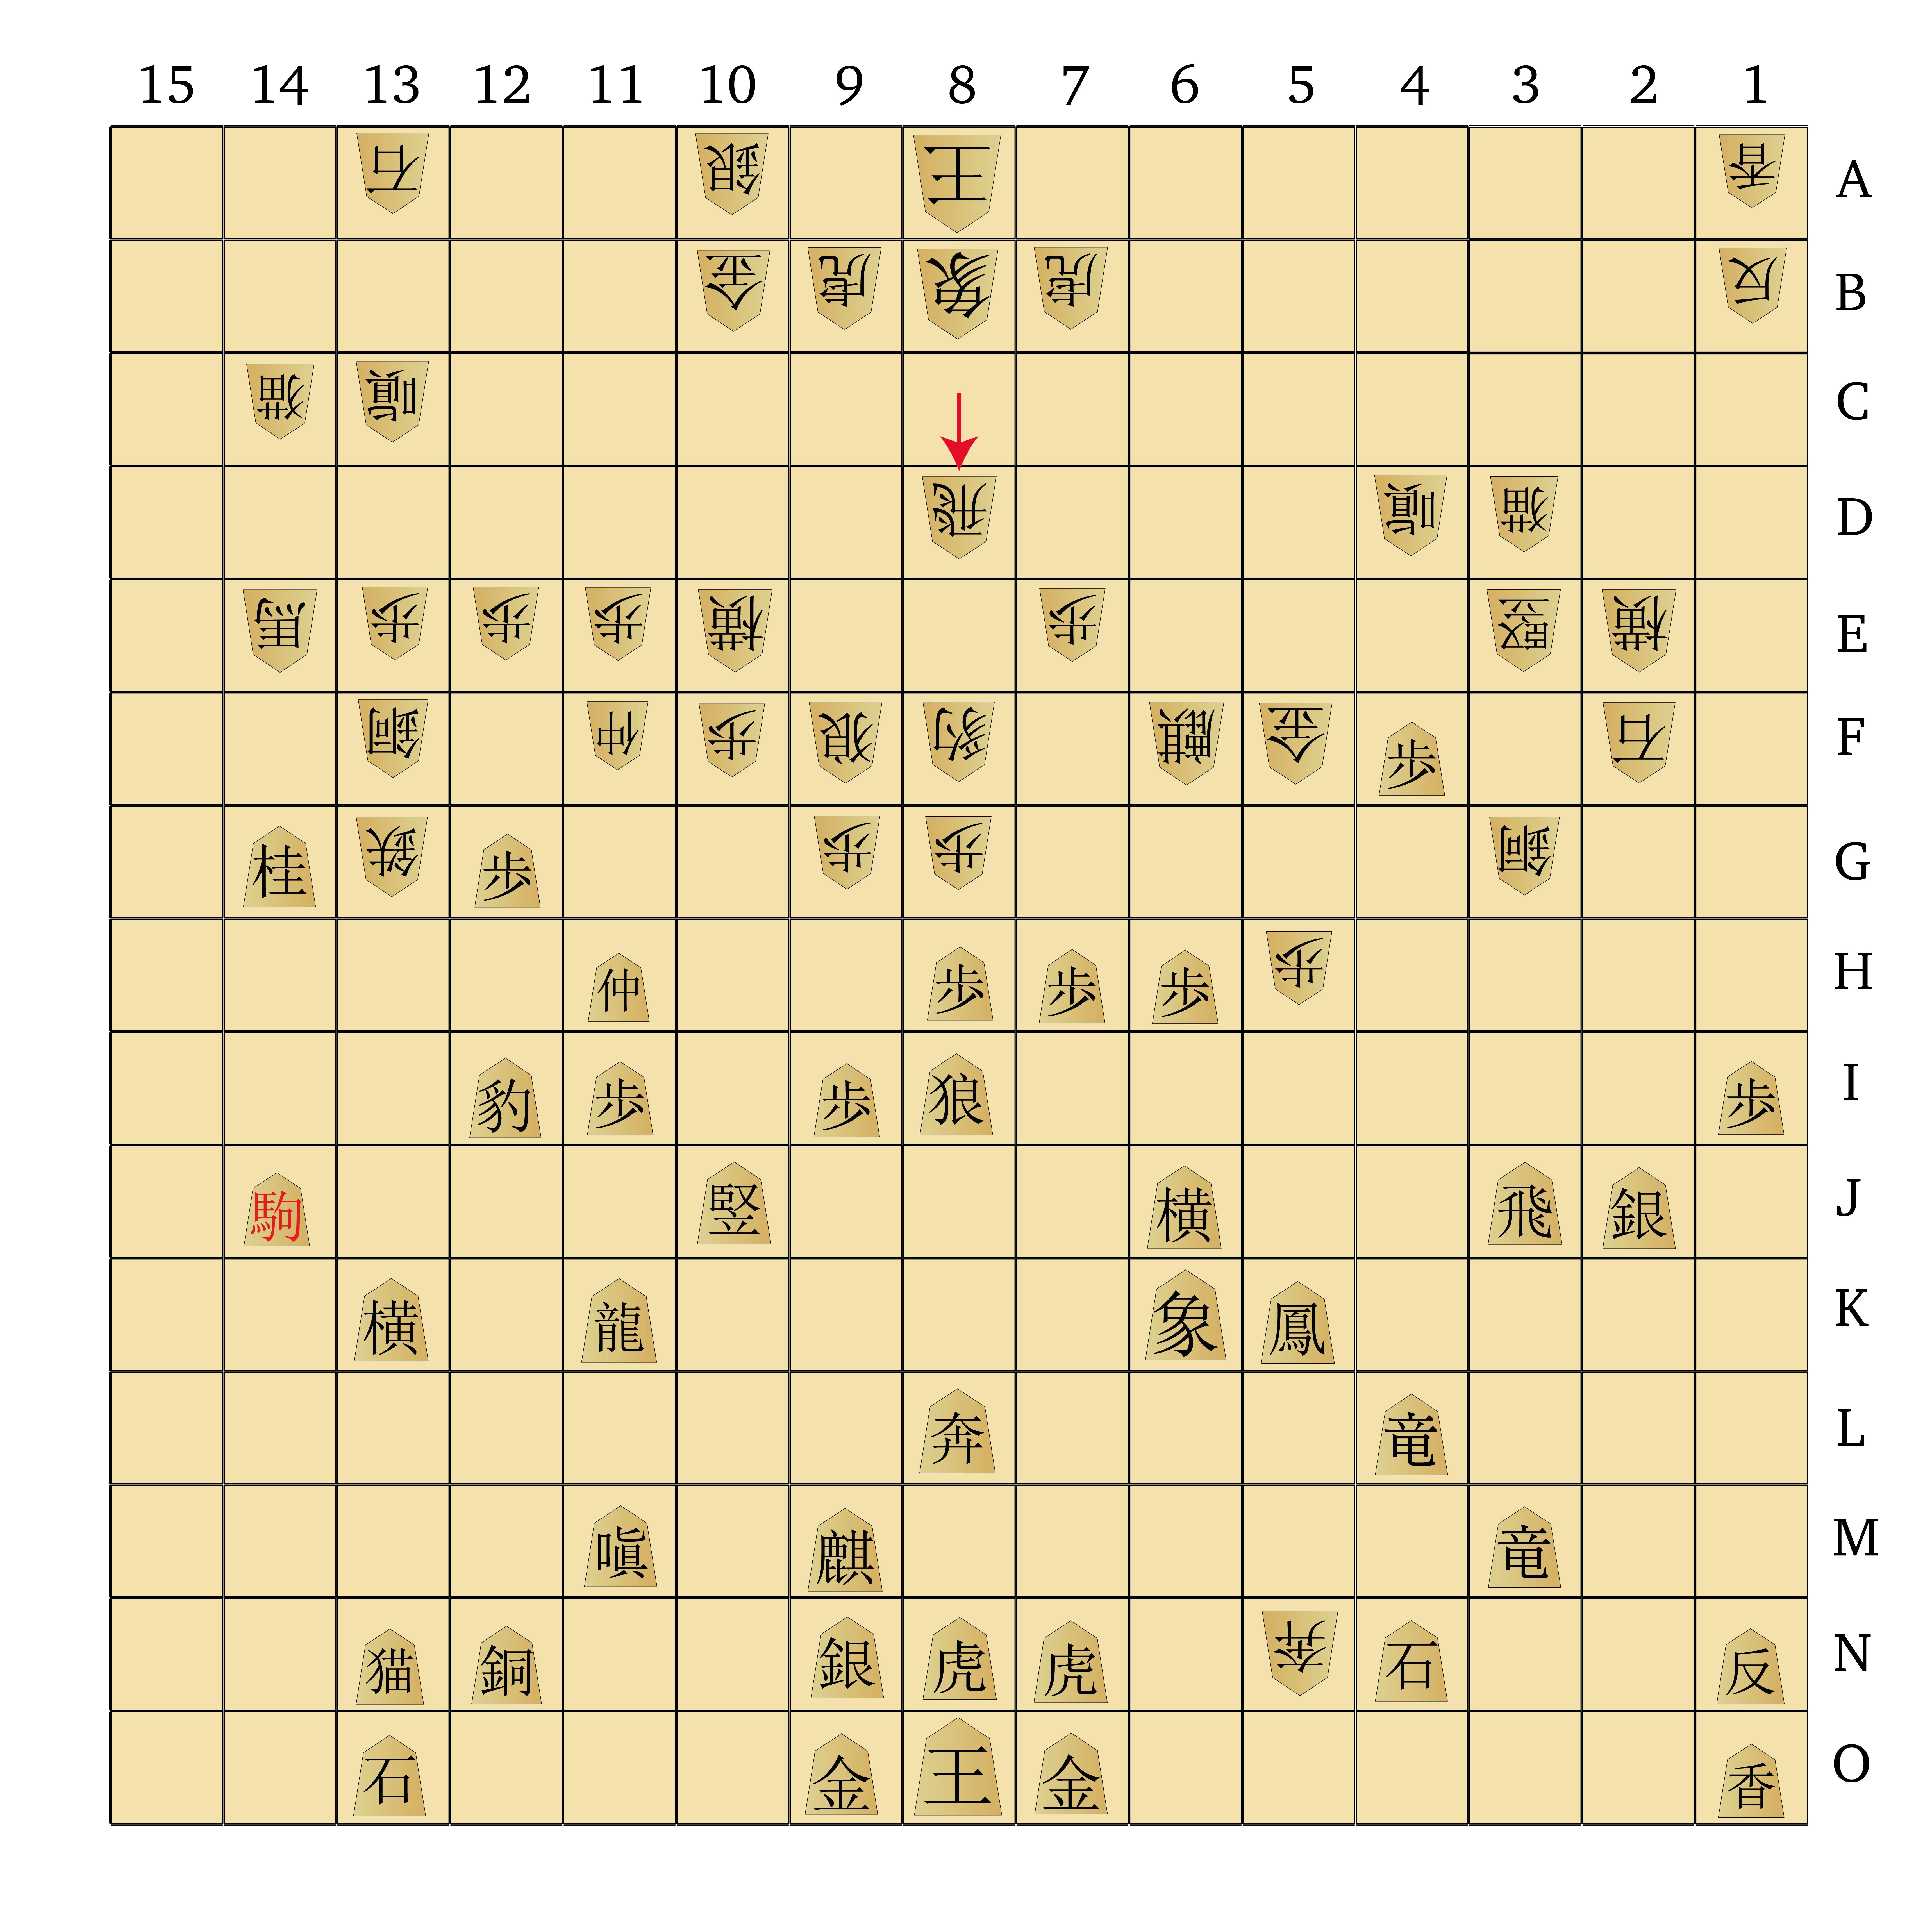 Dai Shogi 420 -- Move 370-01